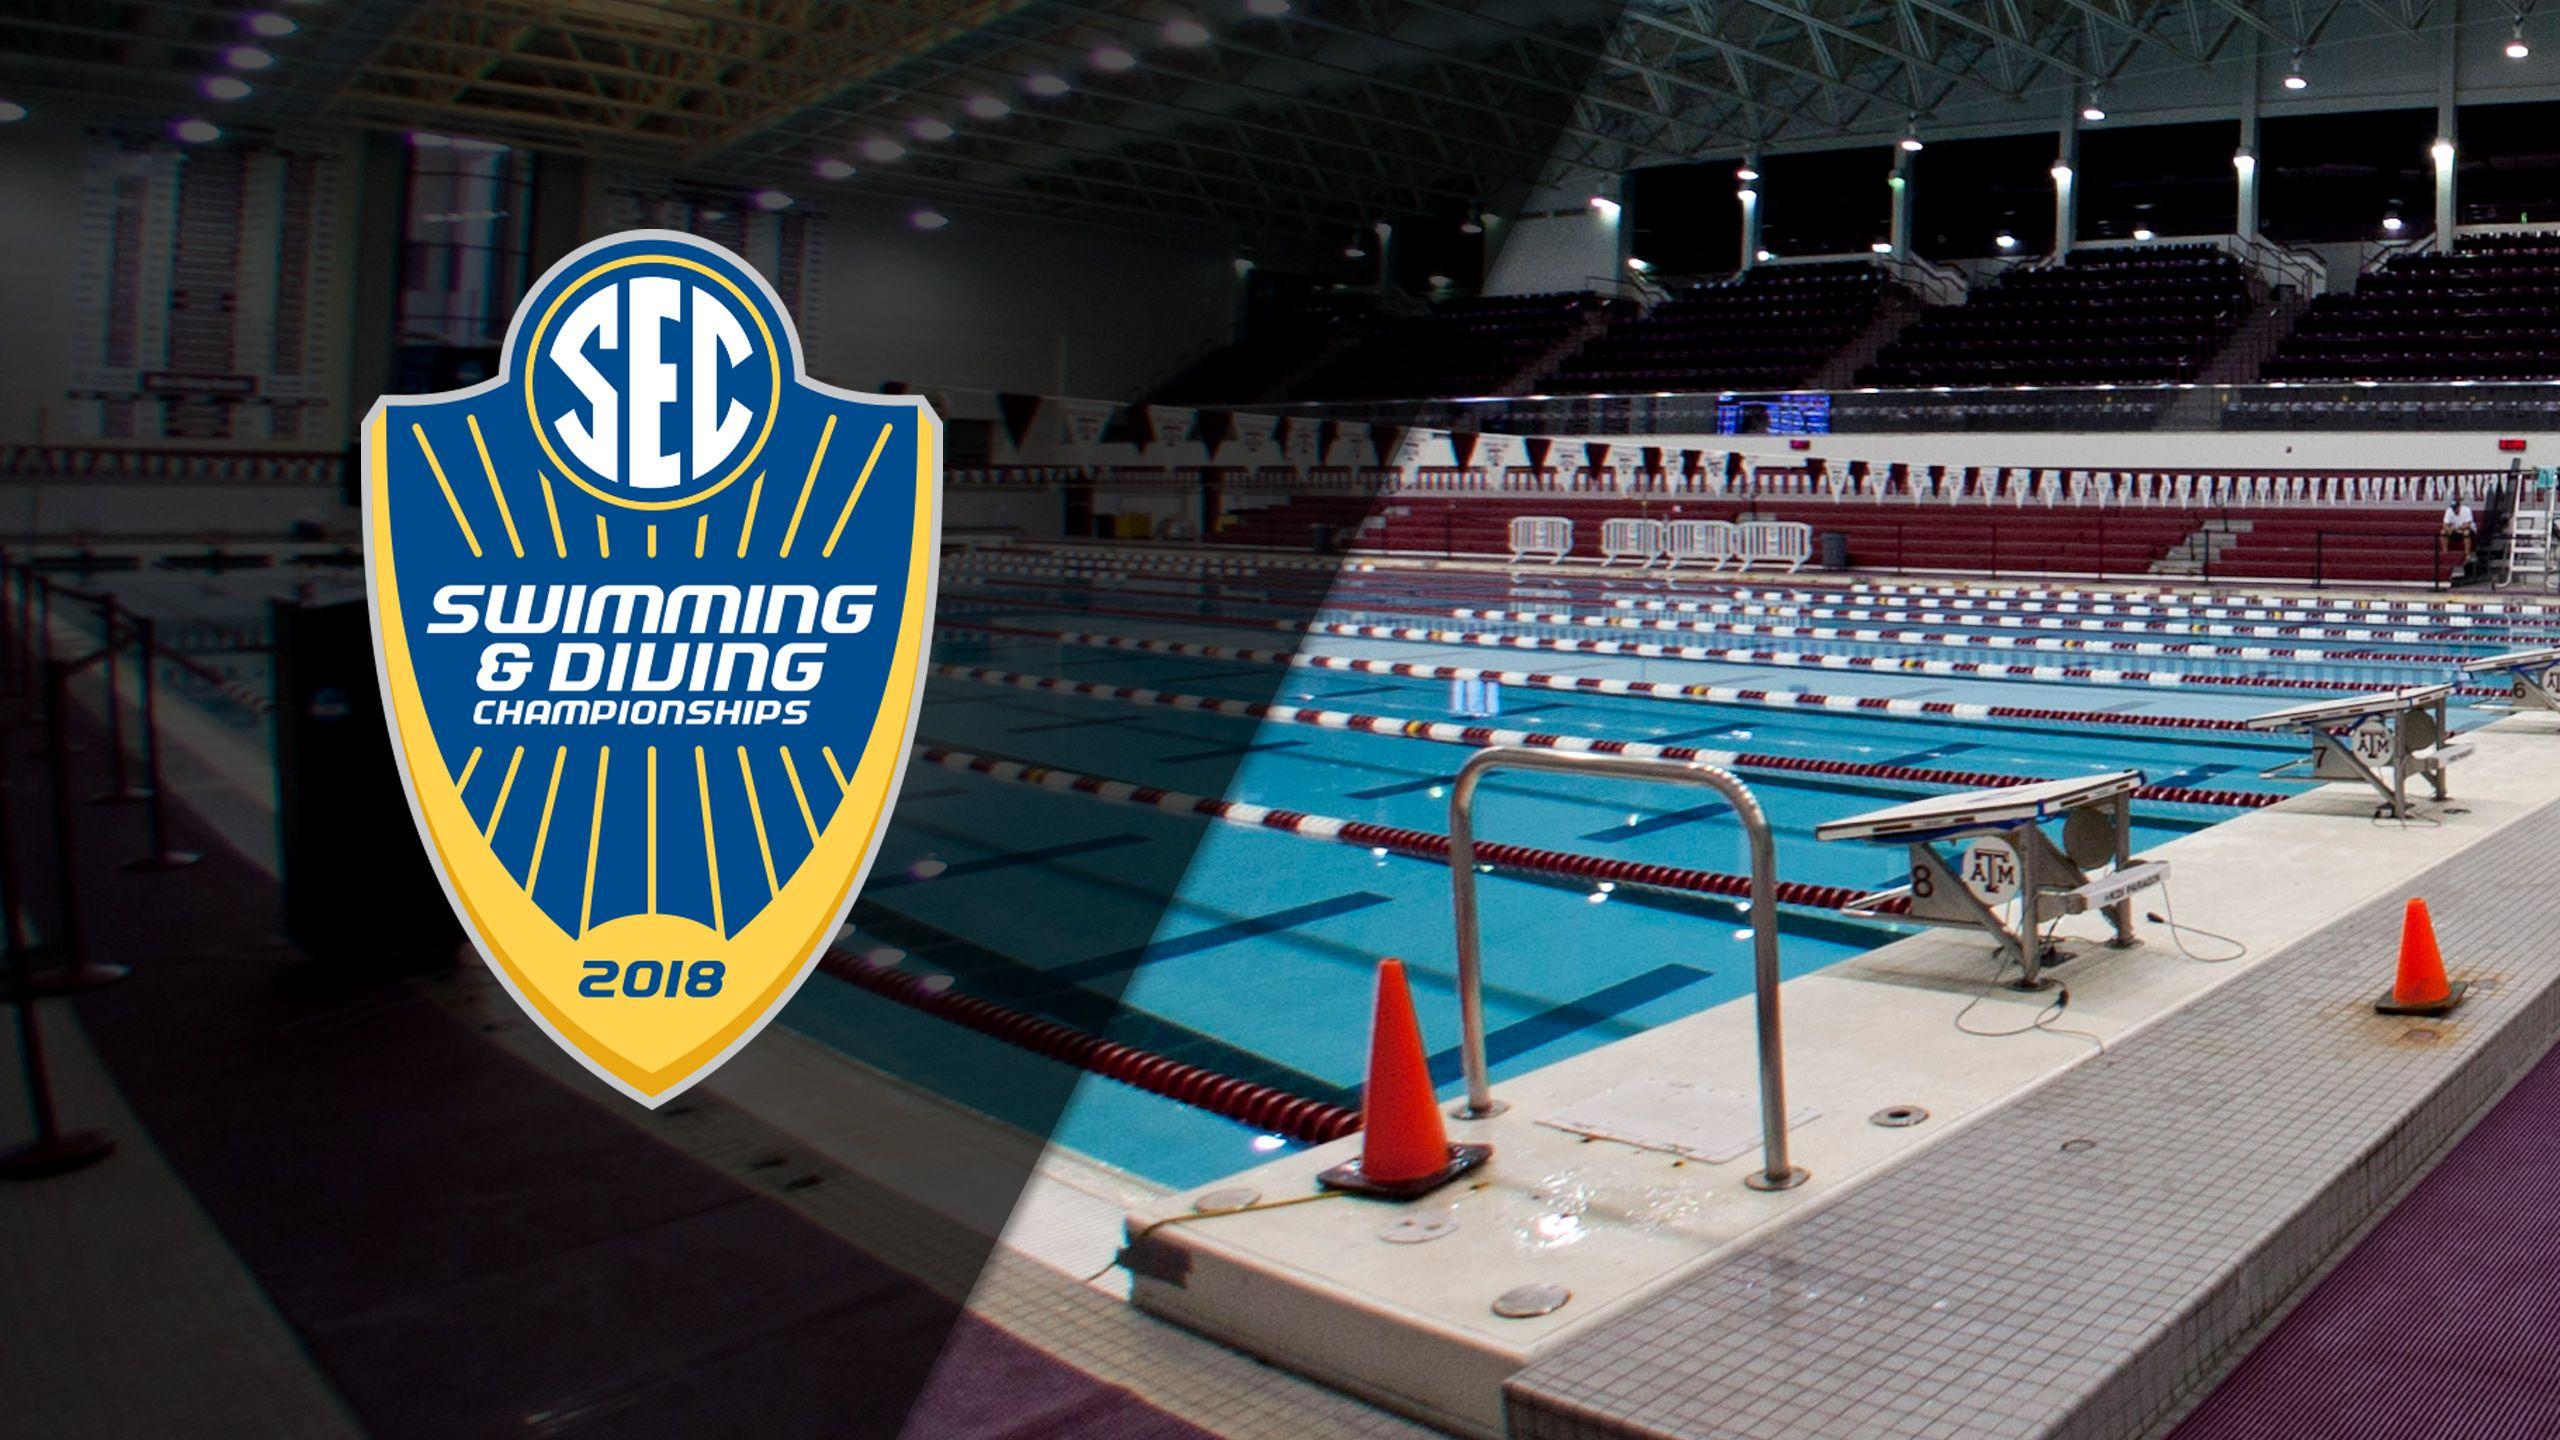 2018 SEC Swimming & Diving Championships